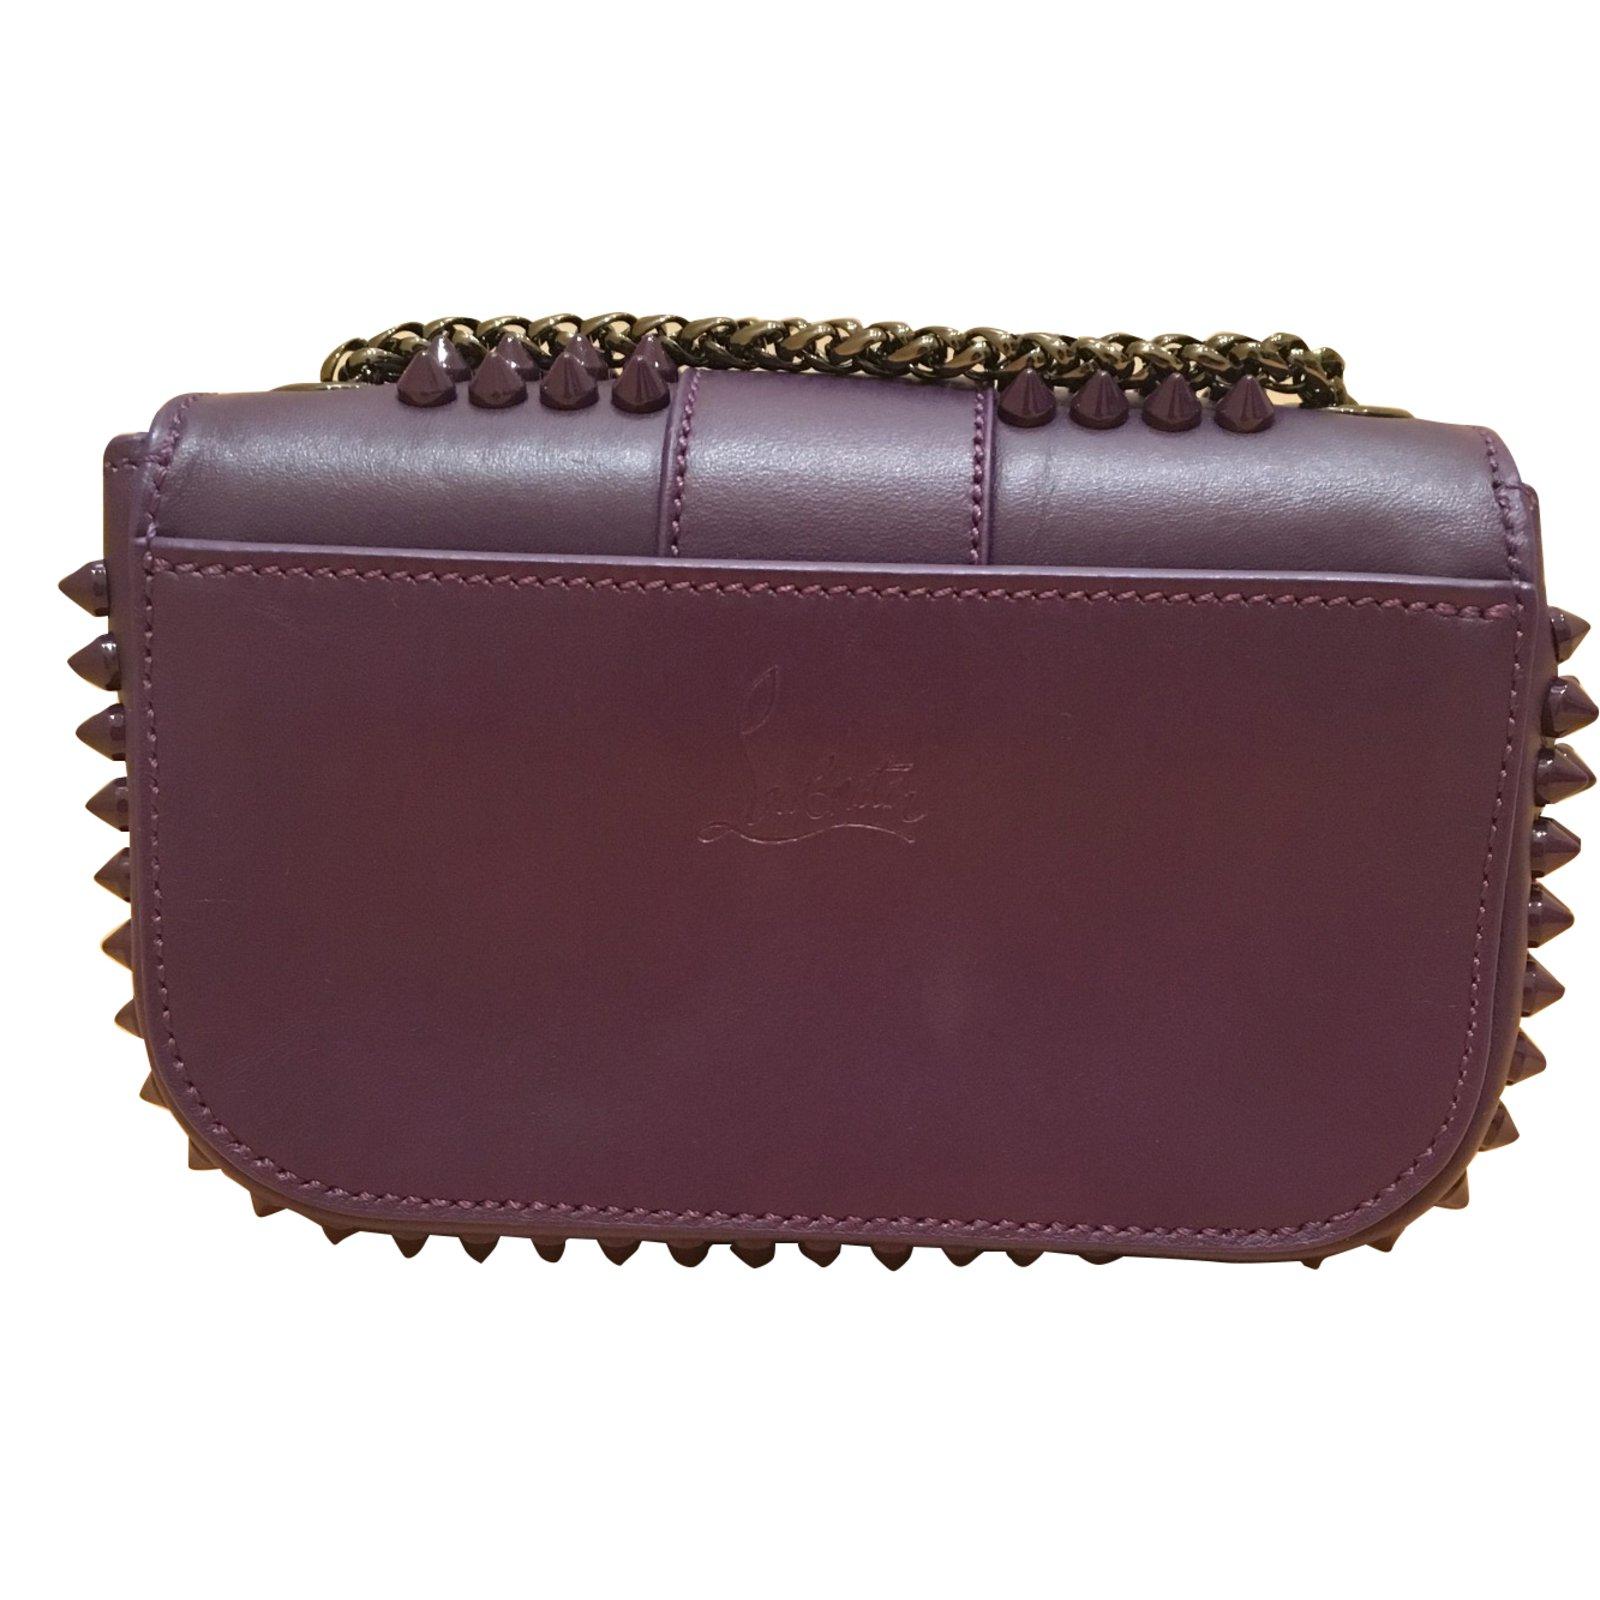 28b21663ae1e Christian Louboutin Sweet Charity Baby Clutch bags Leather Purple ref.70089  - Joli Closet